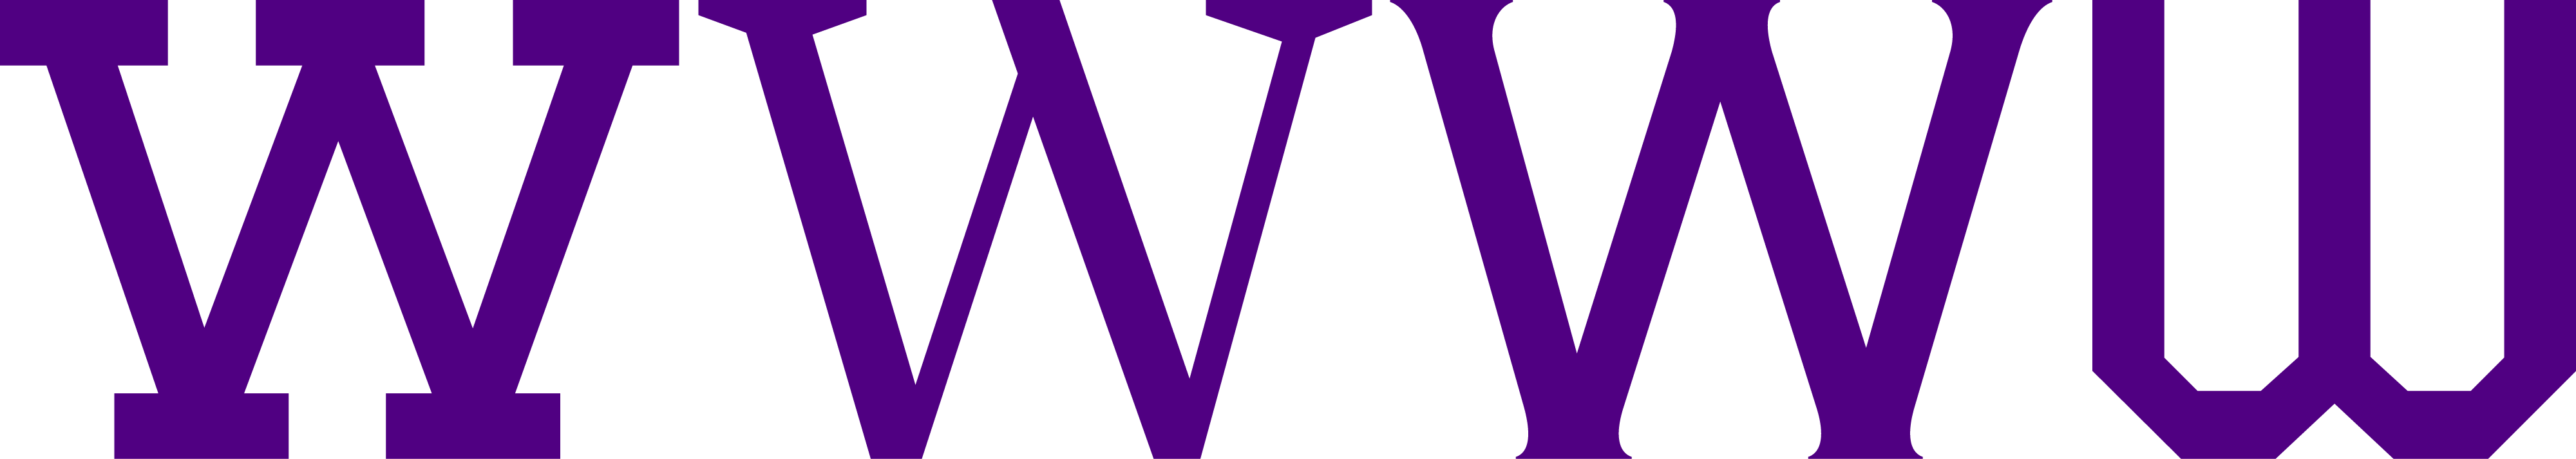 williams_guidelines_type_wwww